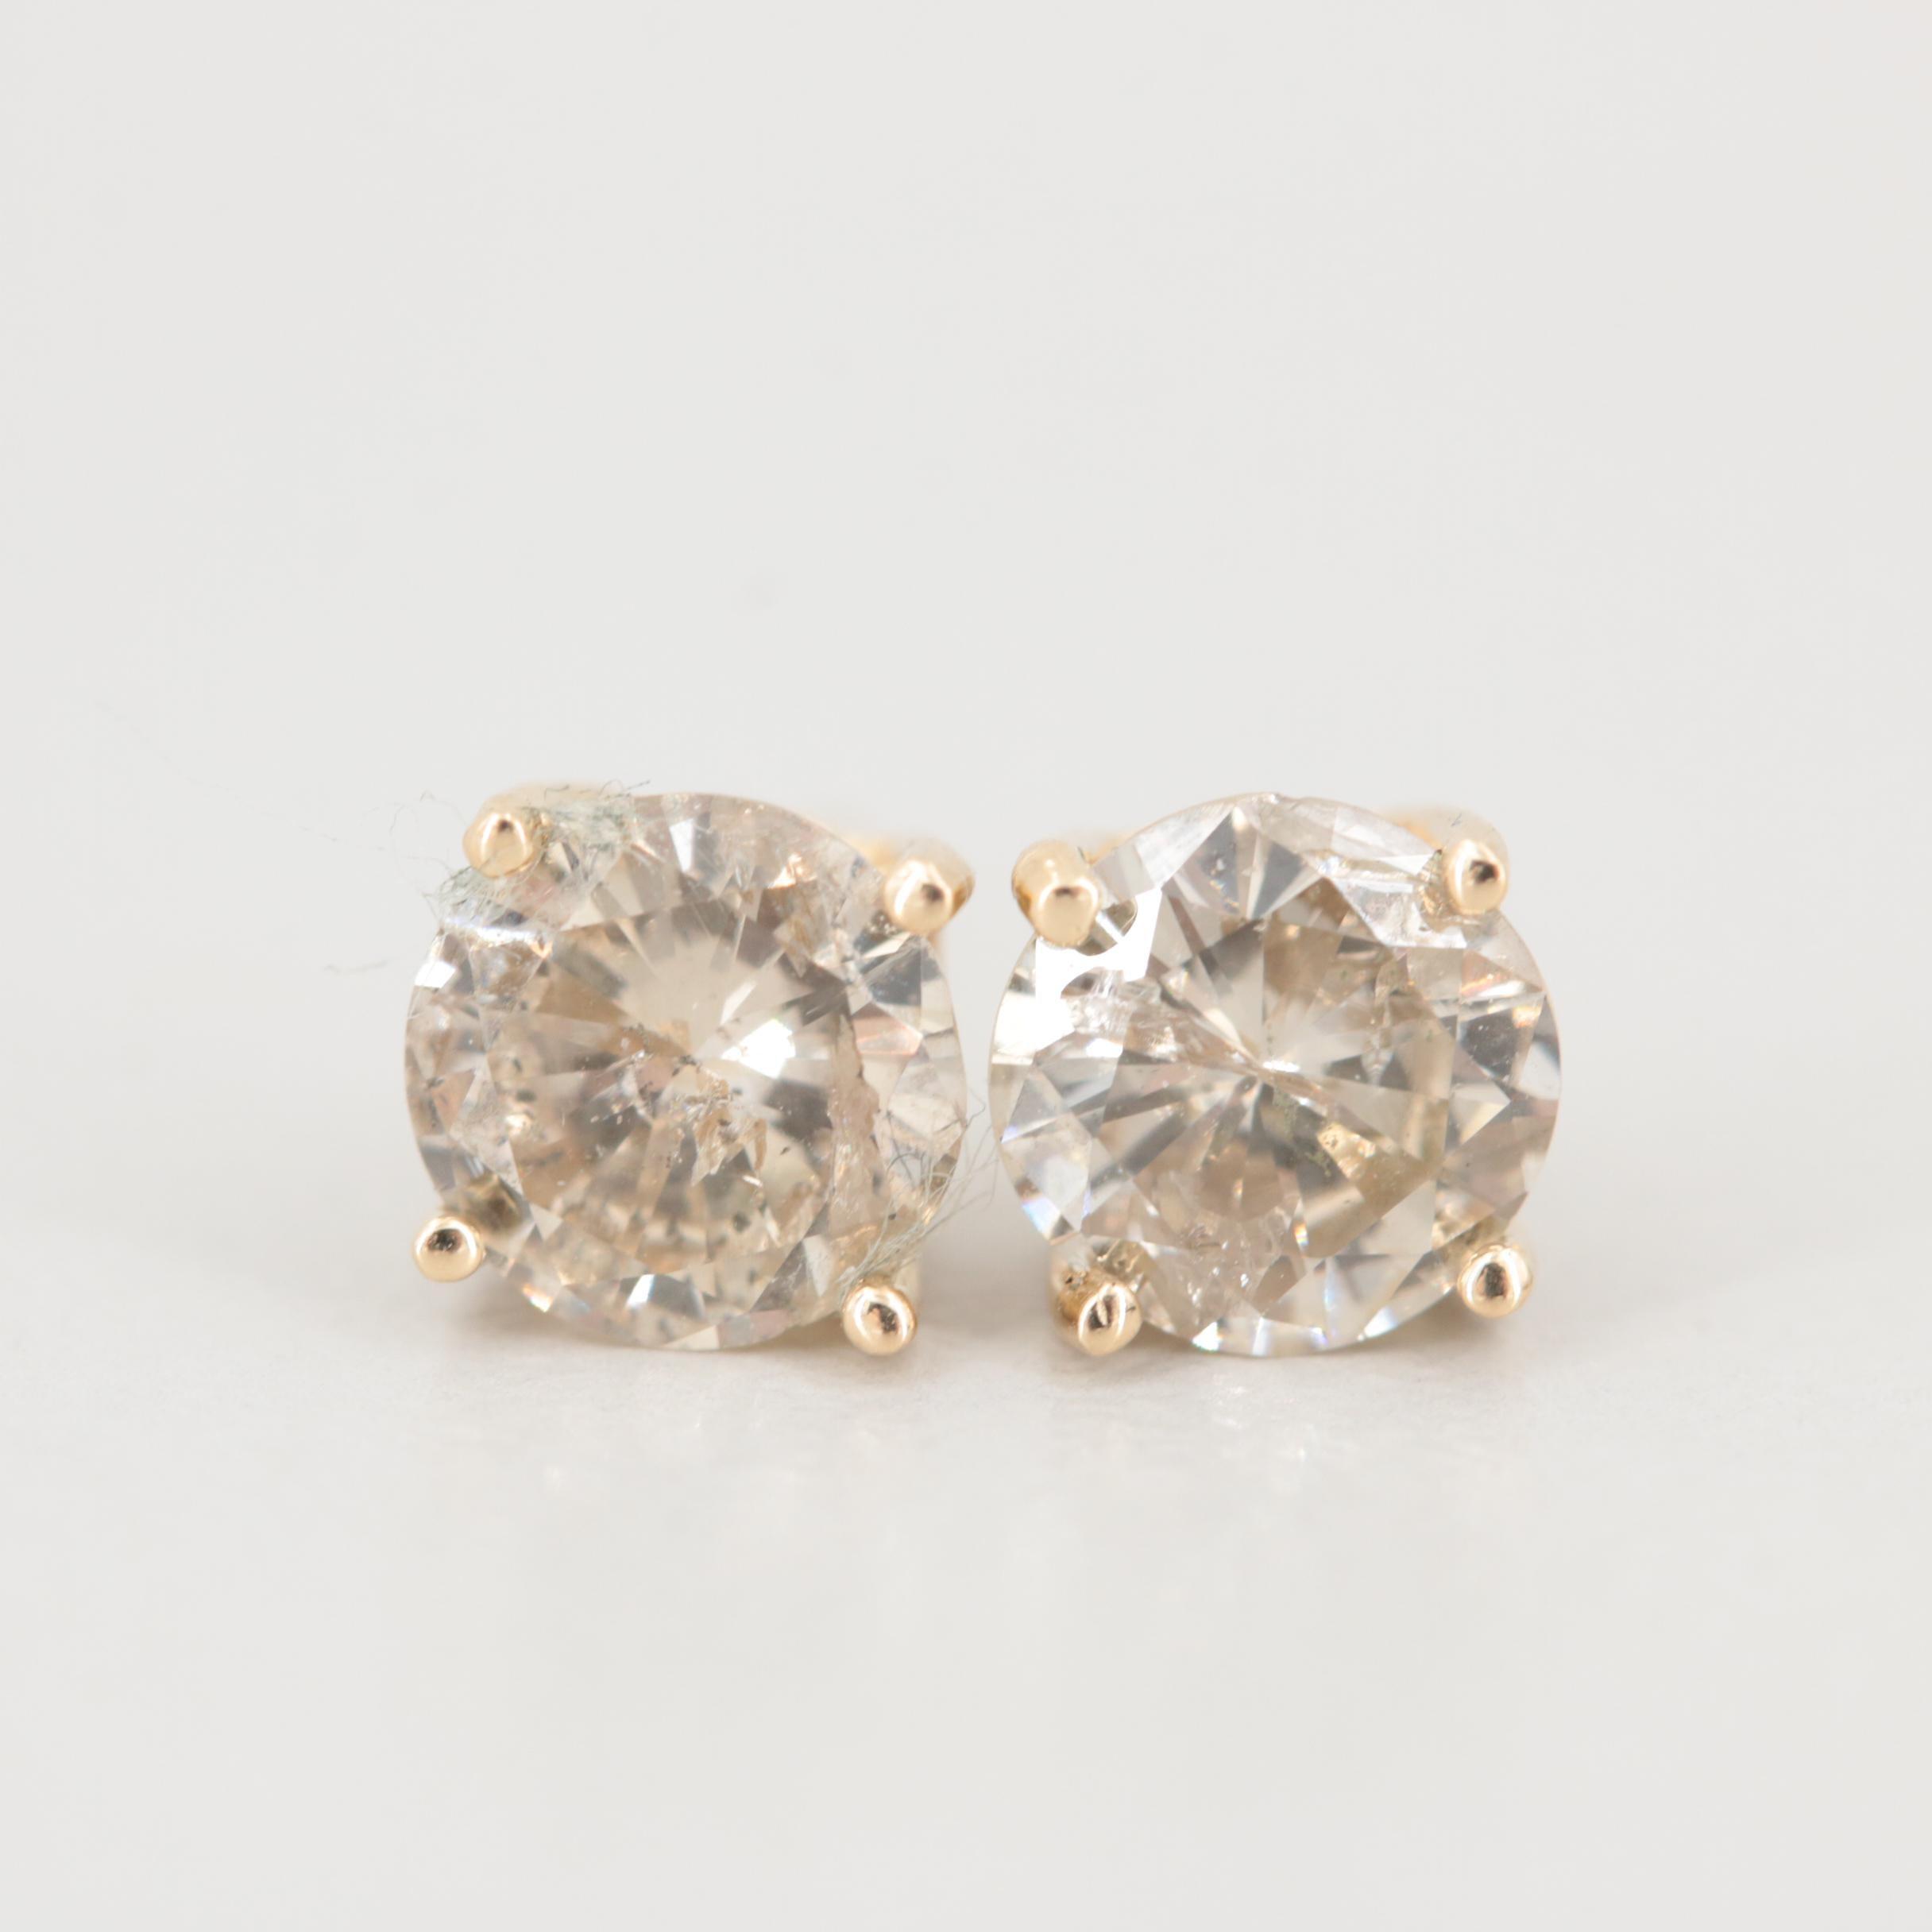 14K Yellow Gold 1.24 CTW Diamond Stud Earrings